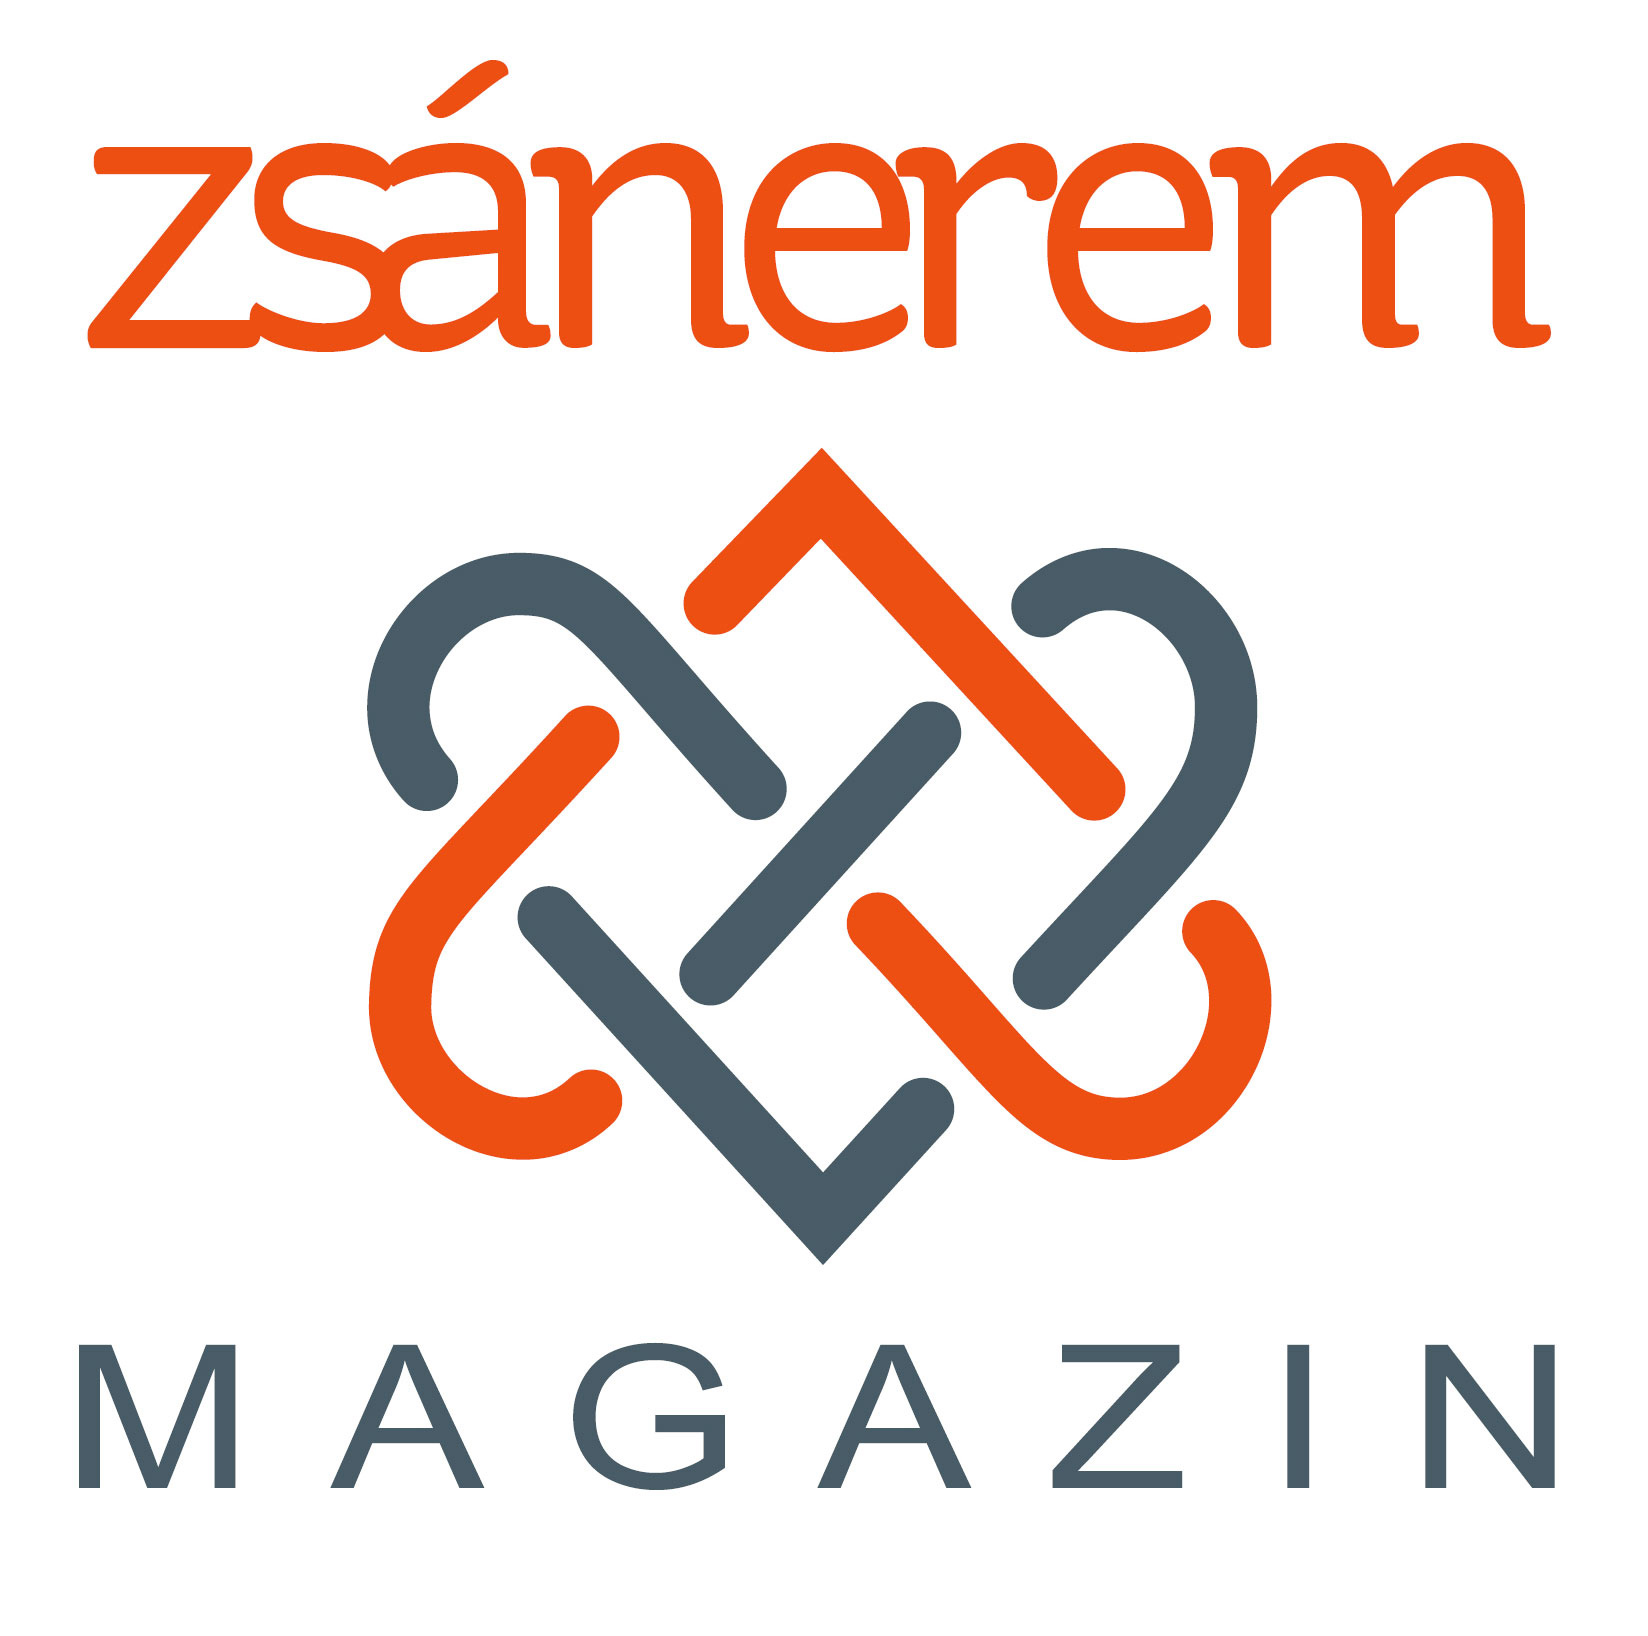 magazin-facebook-logo.jpg